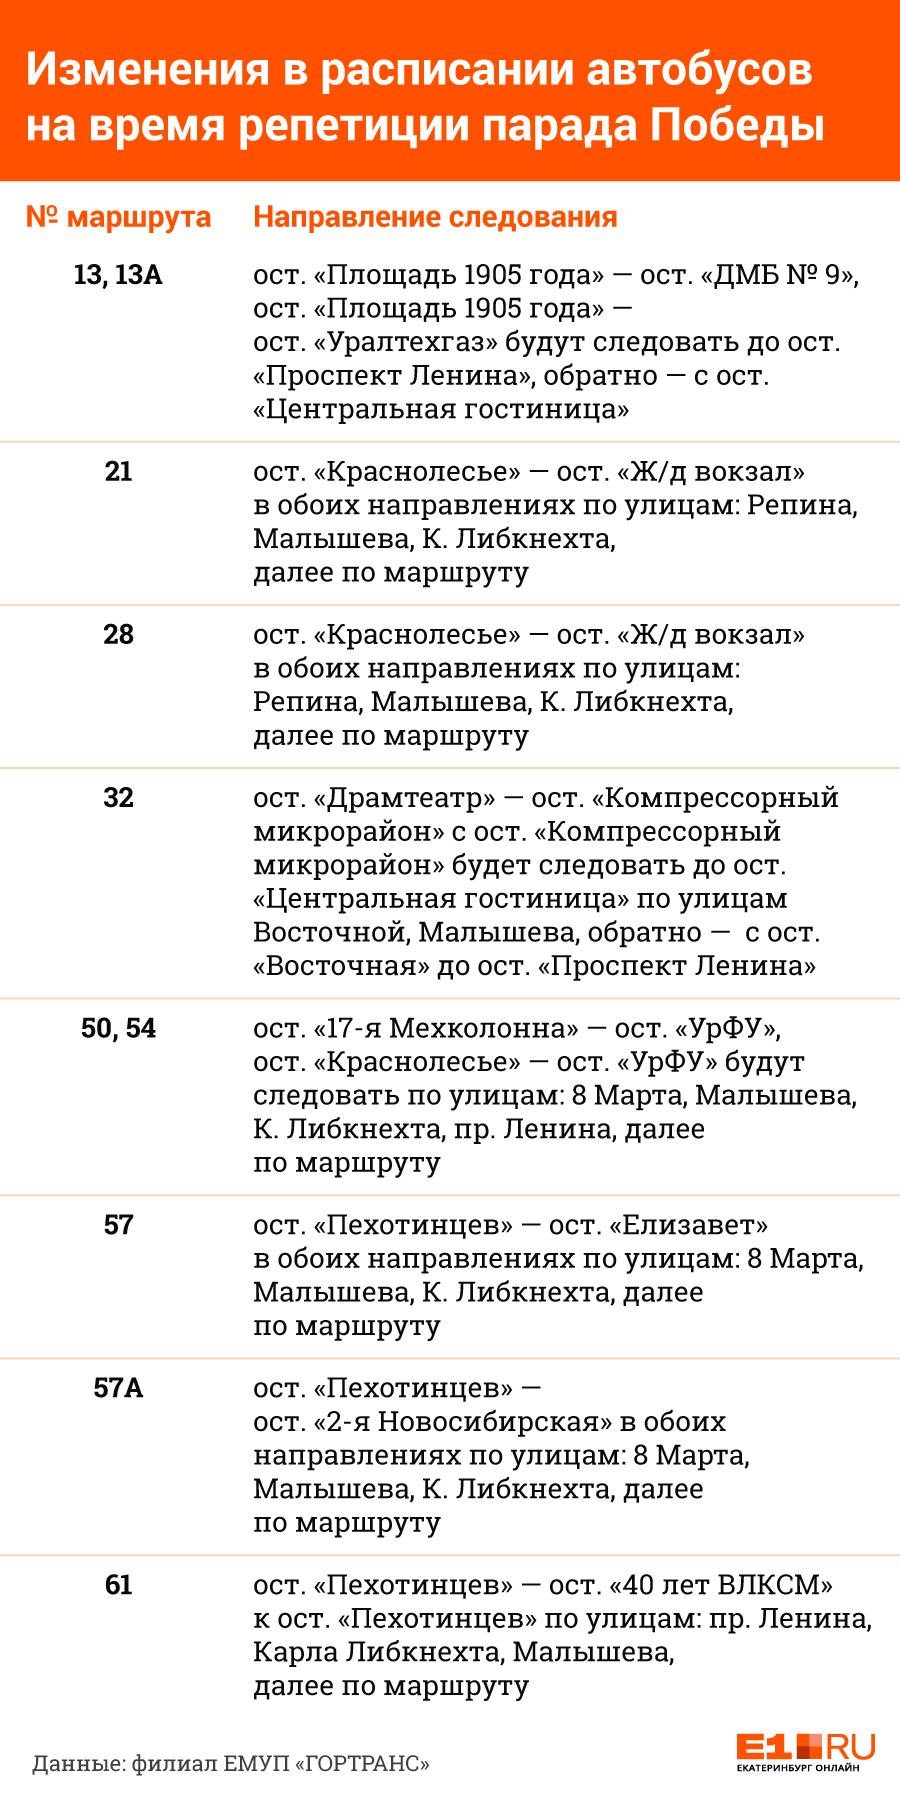 Трамваи и автобусы Екатеринбурга изменят маршруты из-за репетиции парада: публикуем схемы